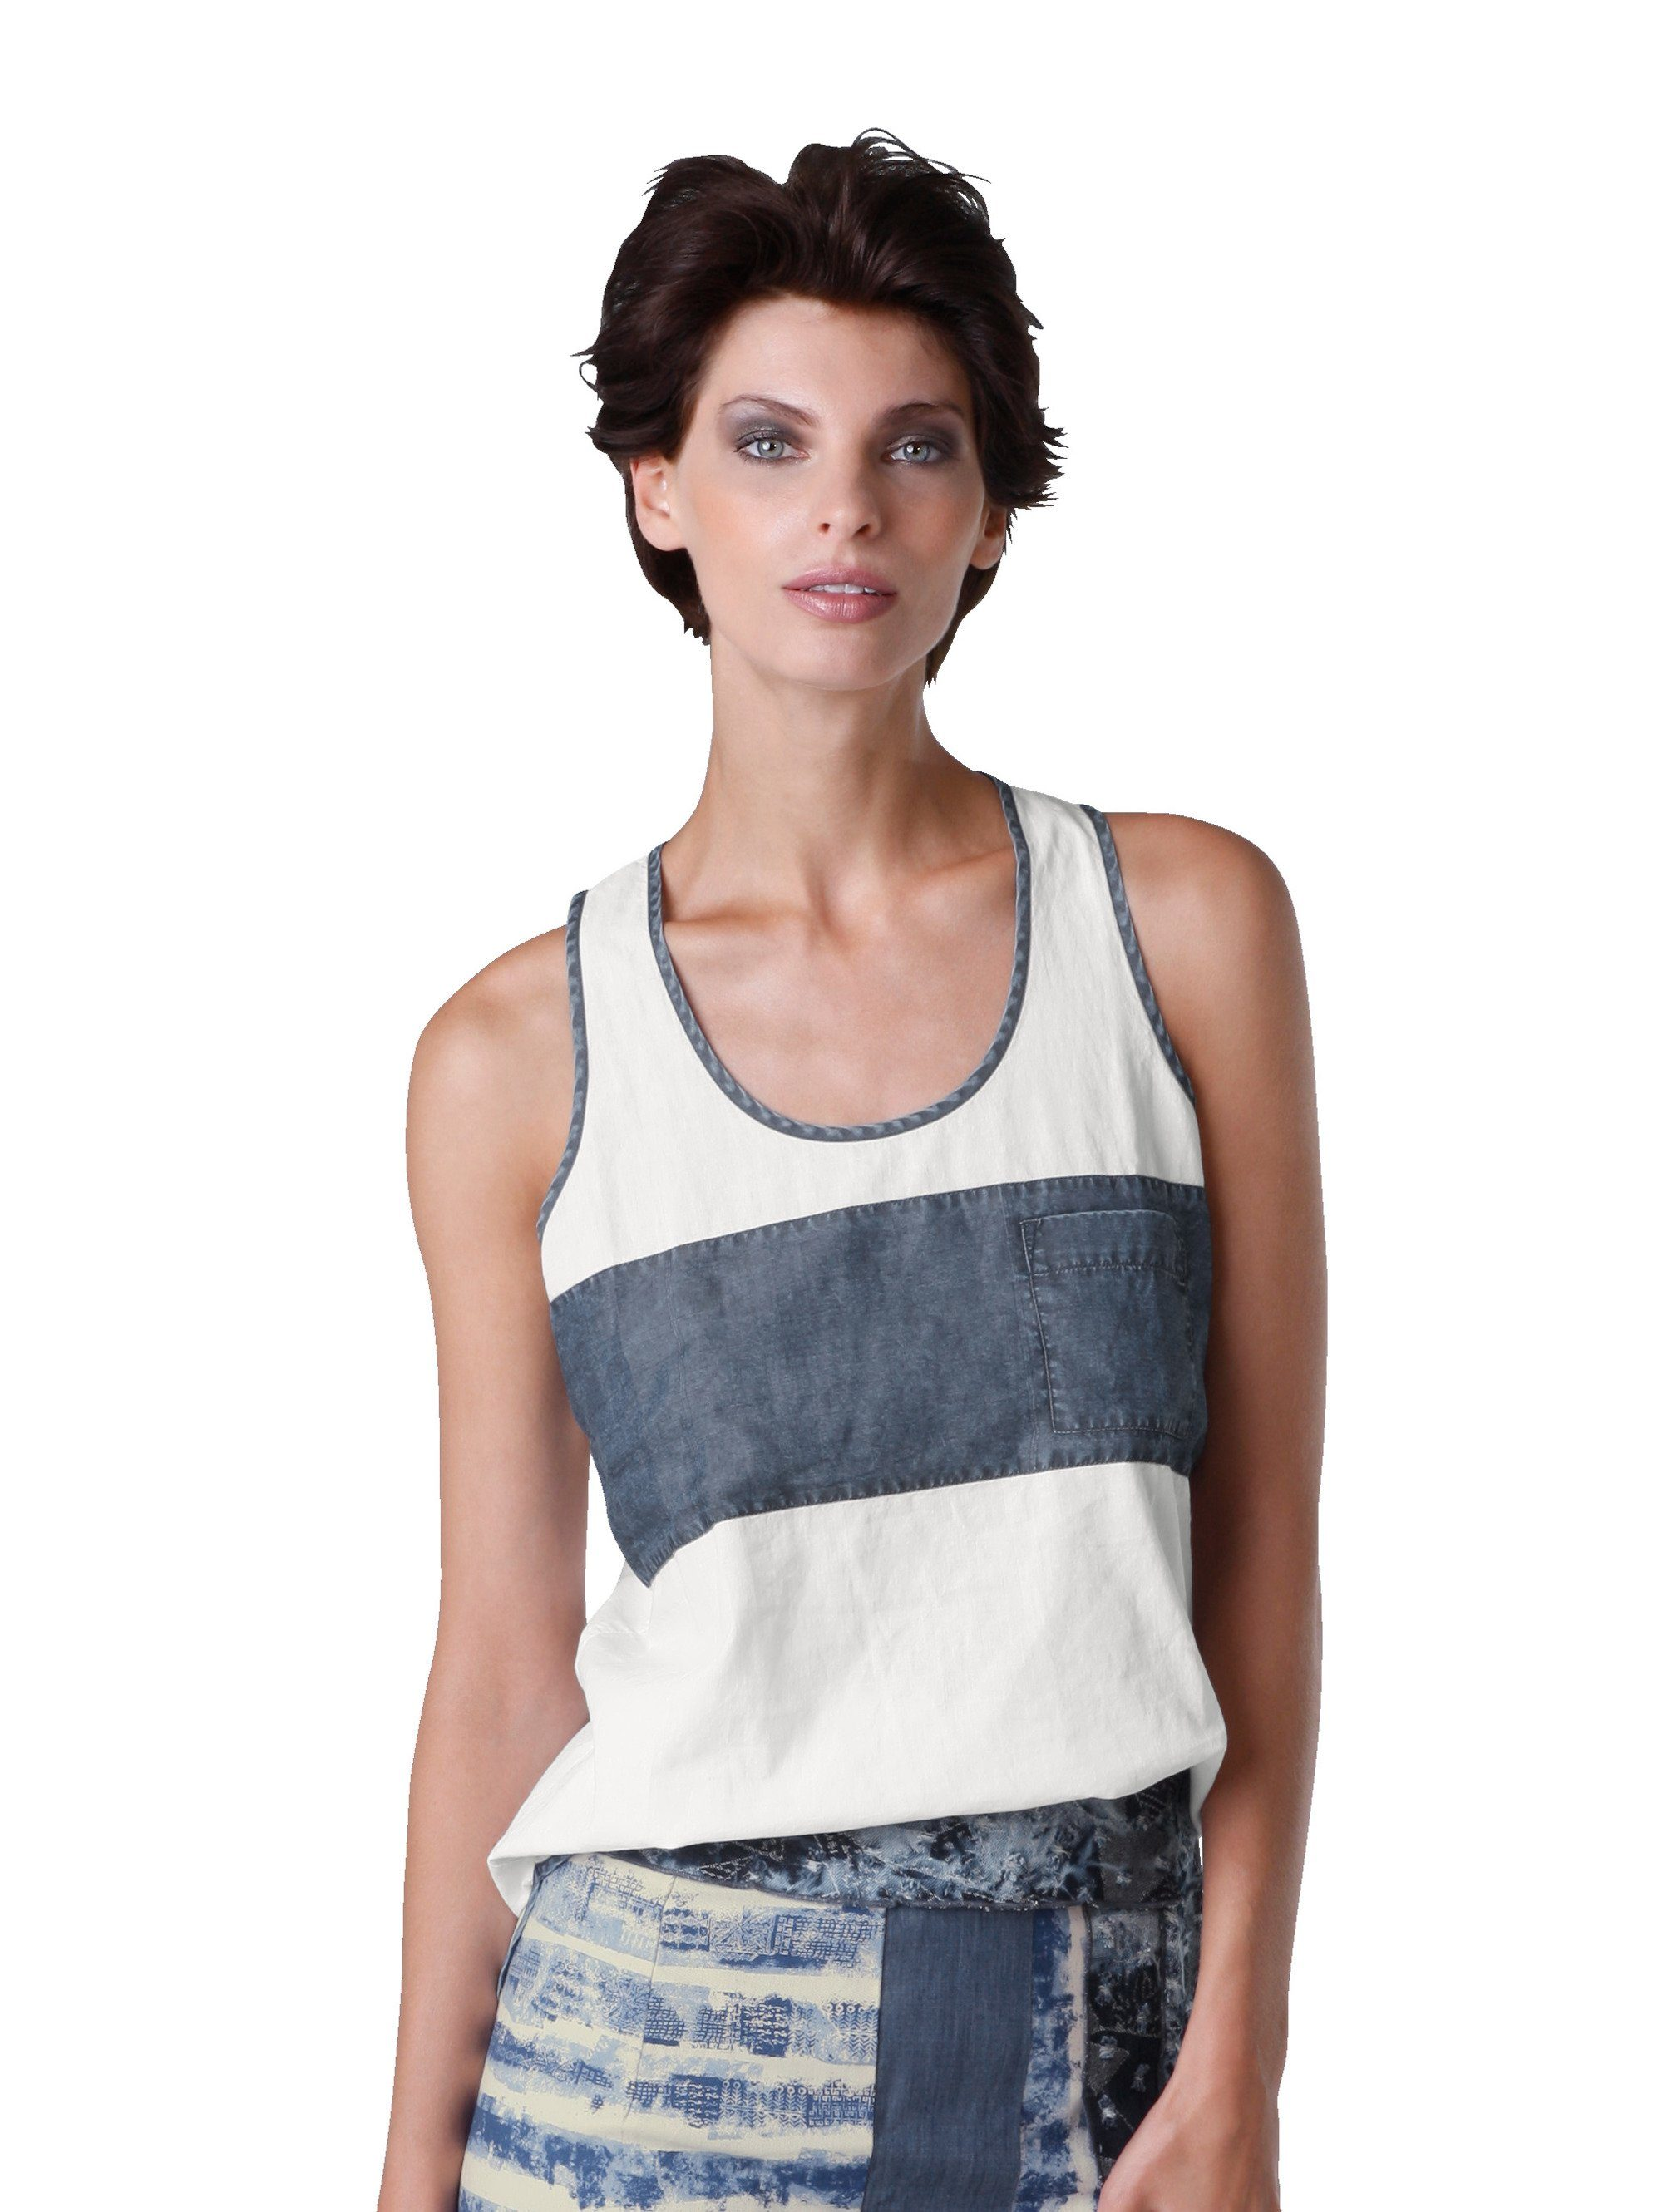 Alba Moda Blusentop mit kontrastfarbigem Einsatz | Bekleidung > Tops > Blusentops | Alba Moda